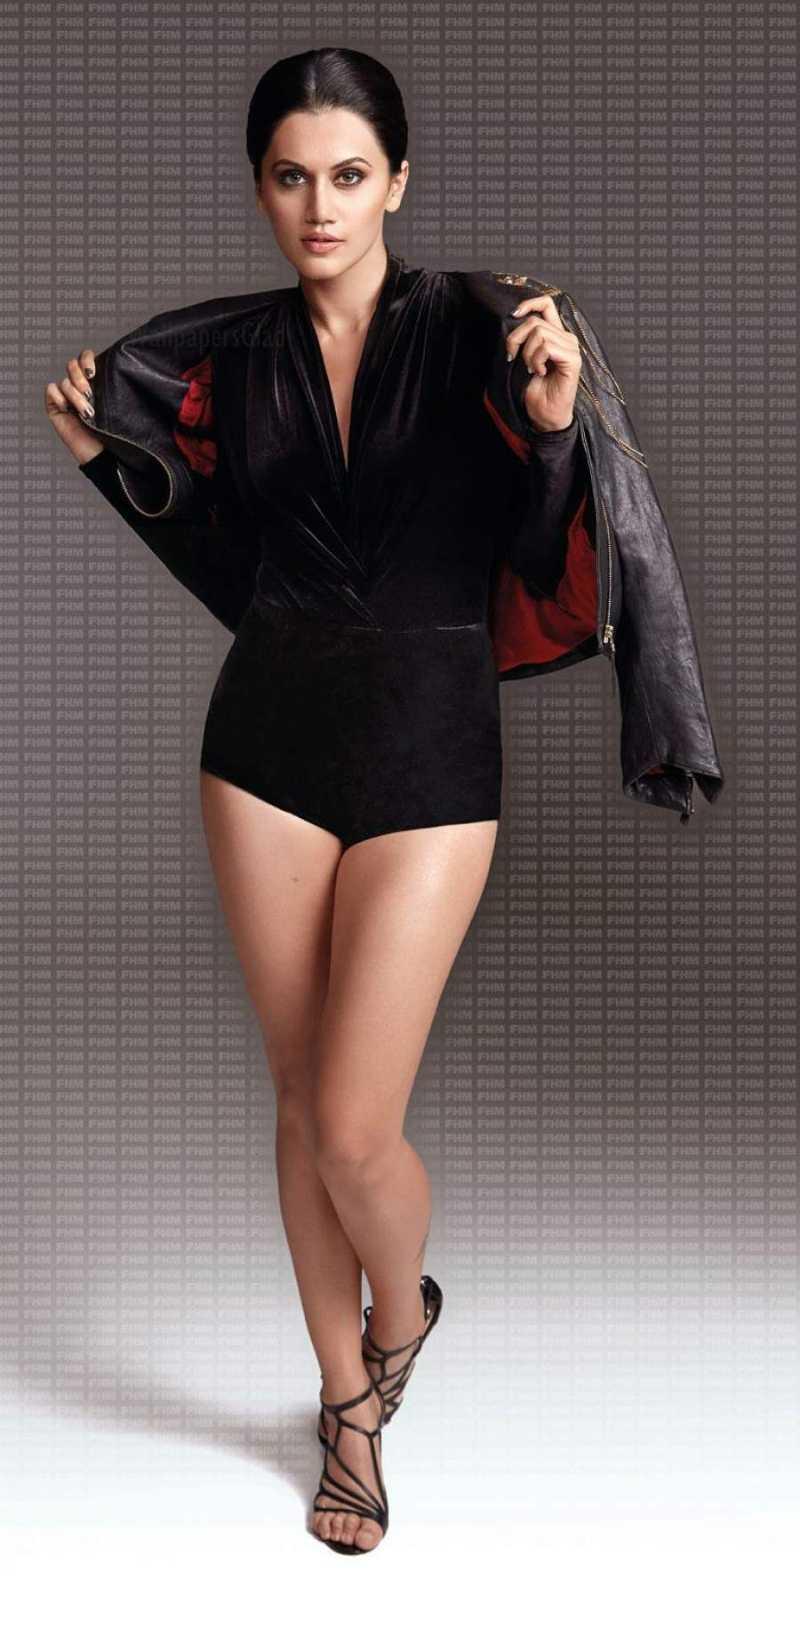 taapsee-pannu-bikini-photoshoot-display-her-hot-legs